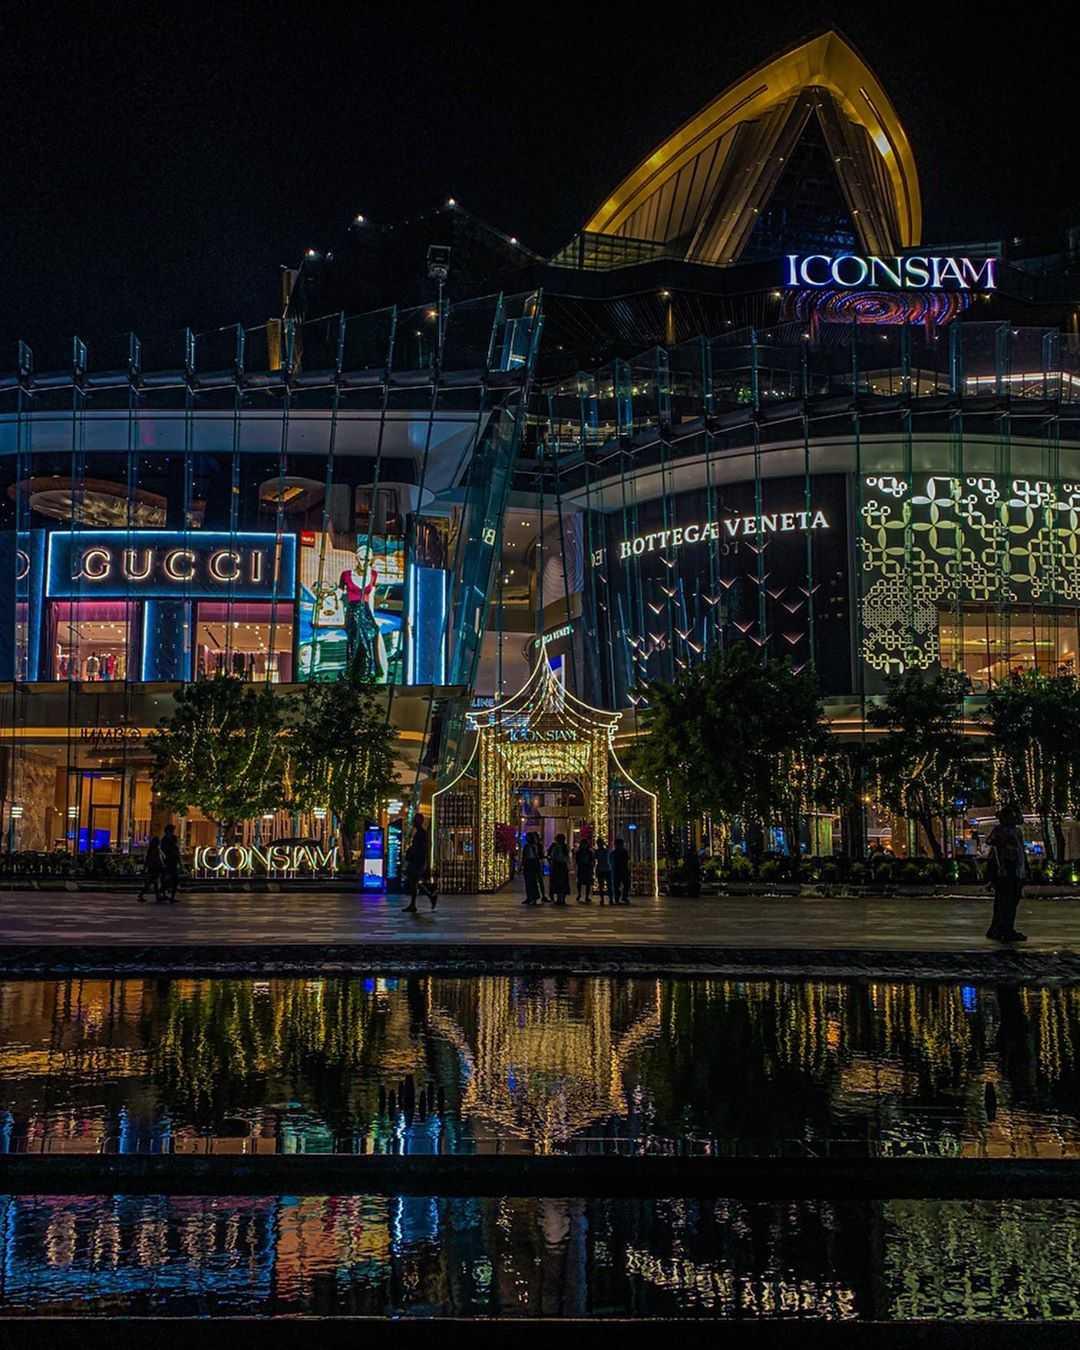 Verlichtte ICONSIAM gezien vanaf de Chao Phraya in Bangkok